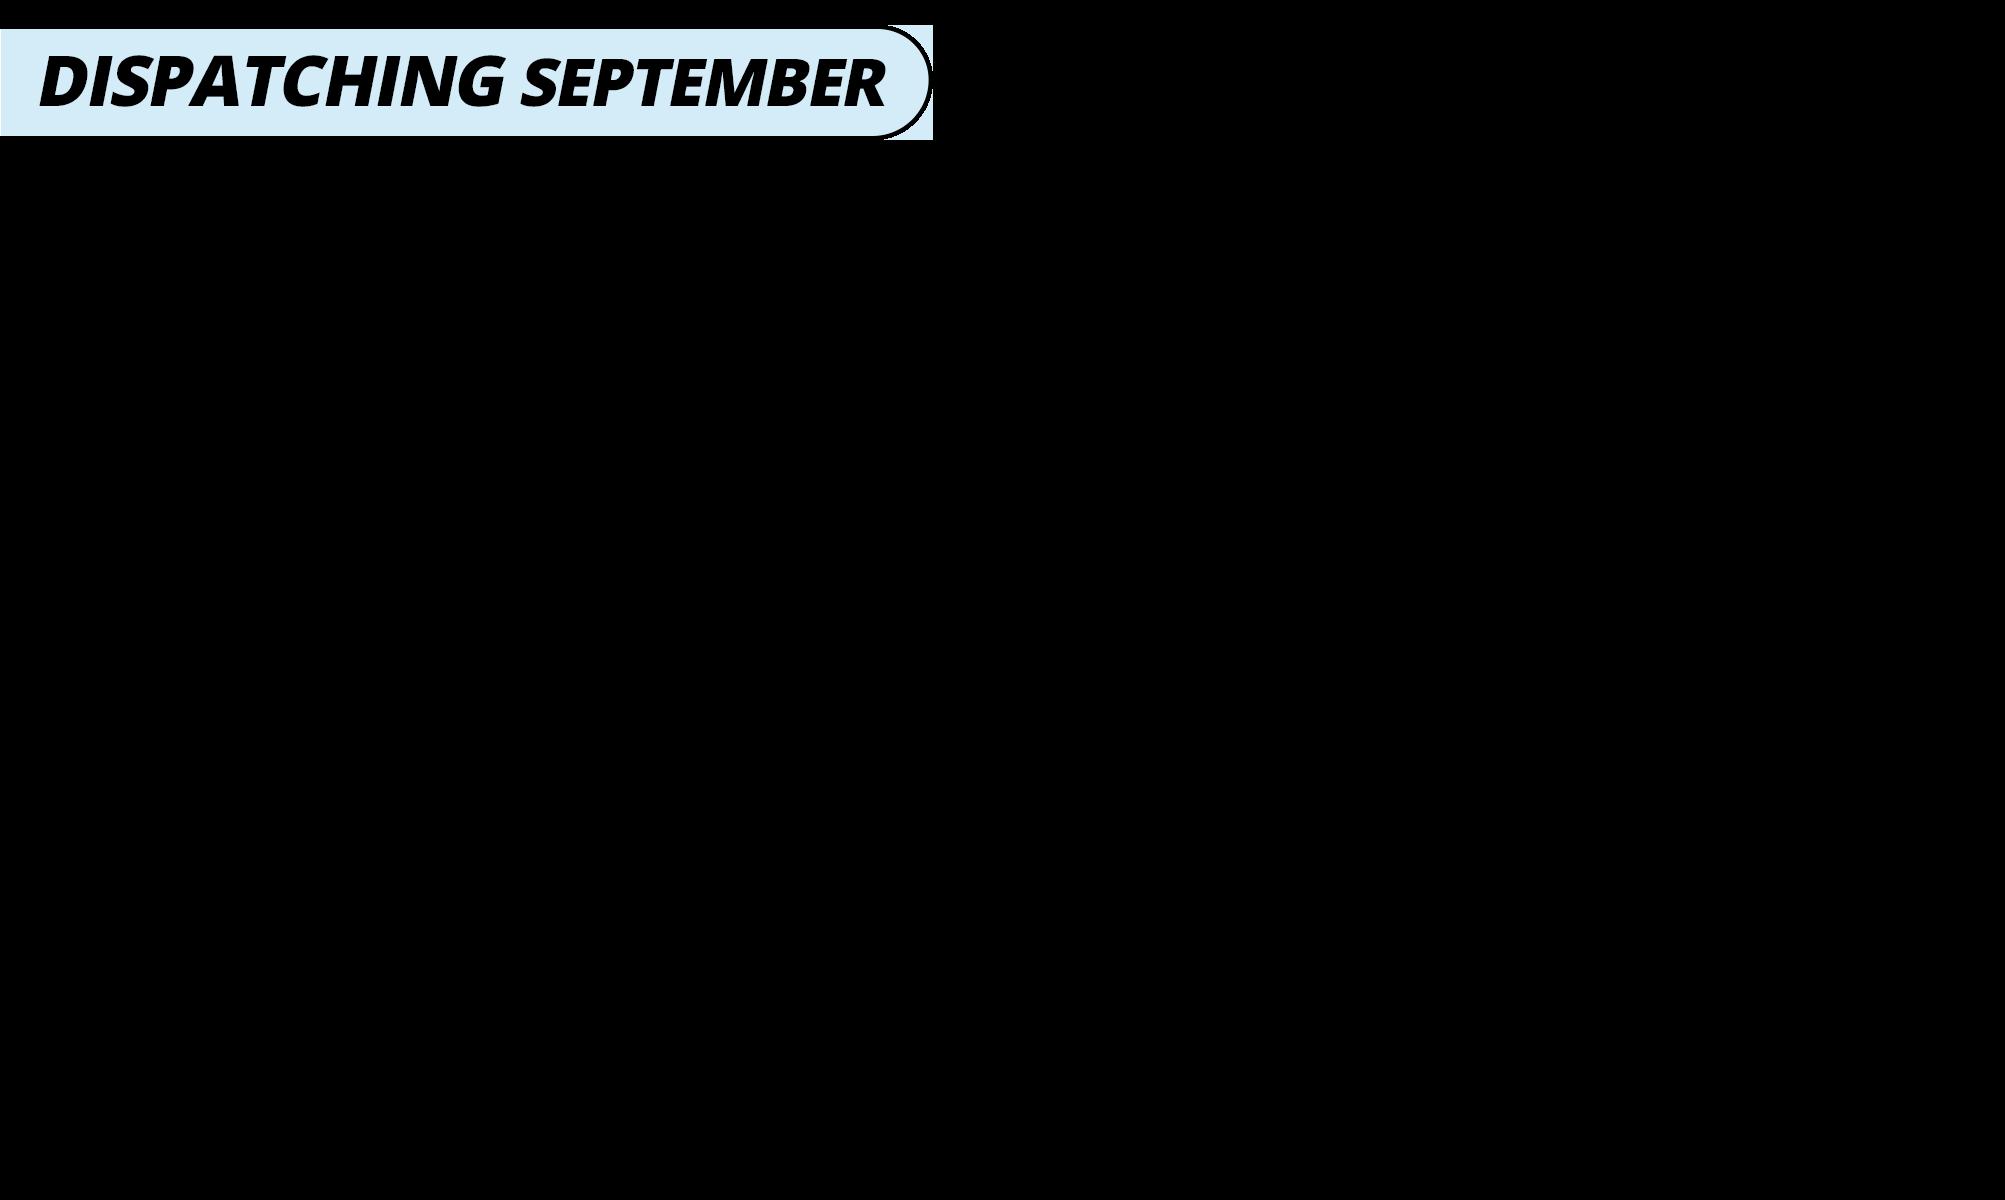 Dispatching september   blue